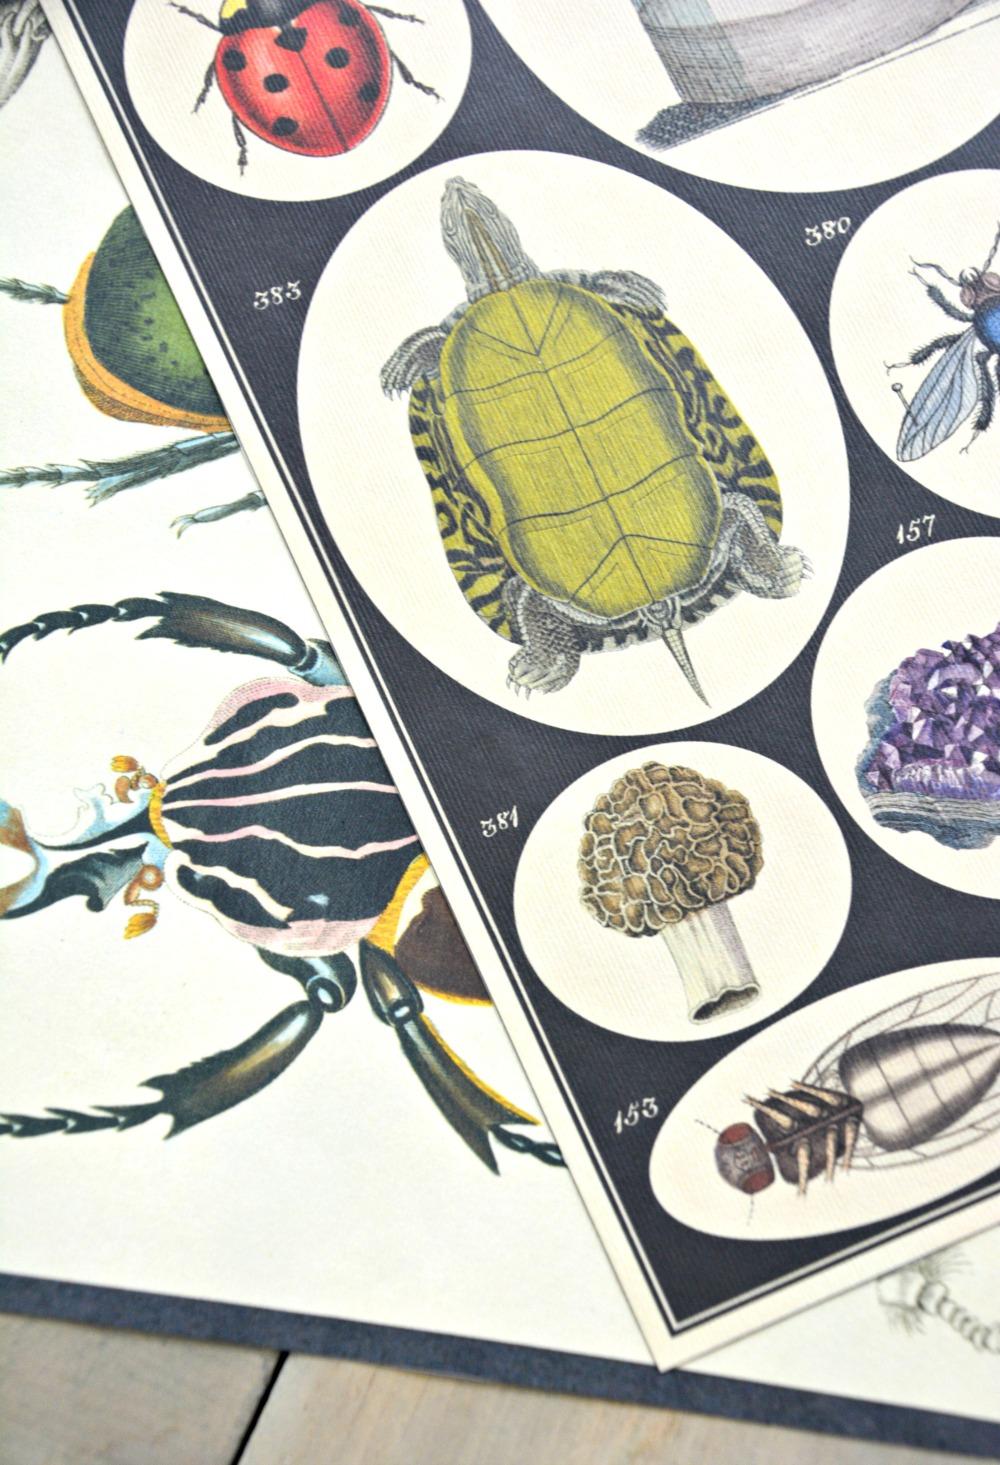 insect-curiousities-calendar-art